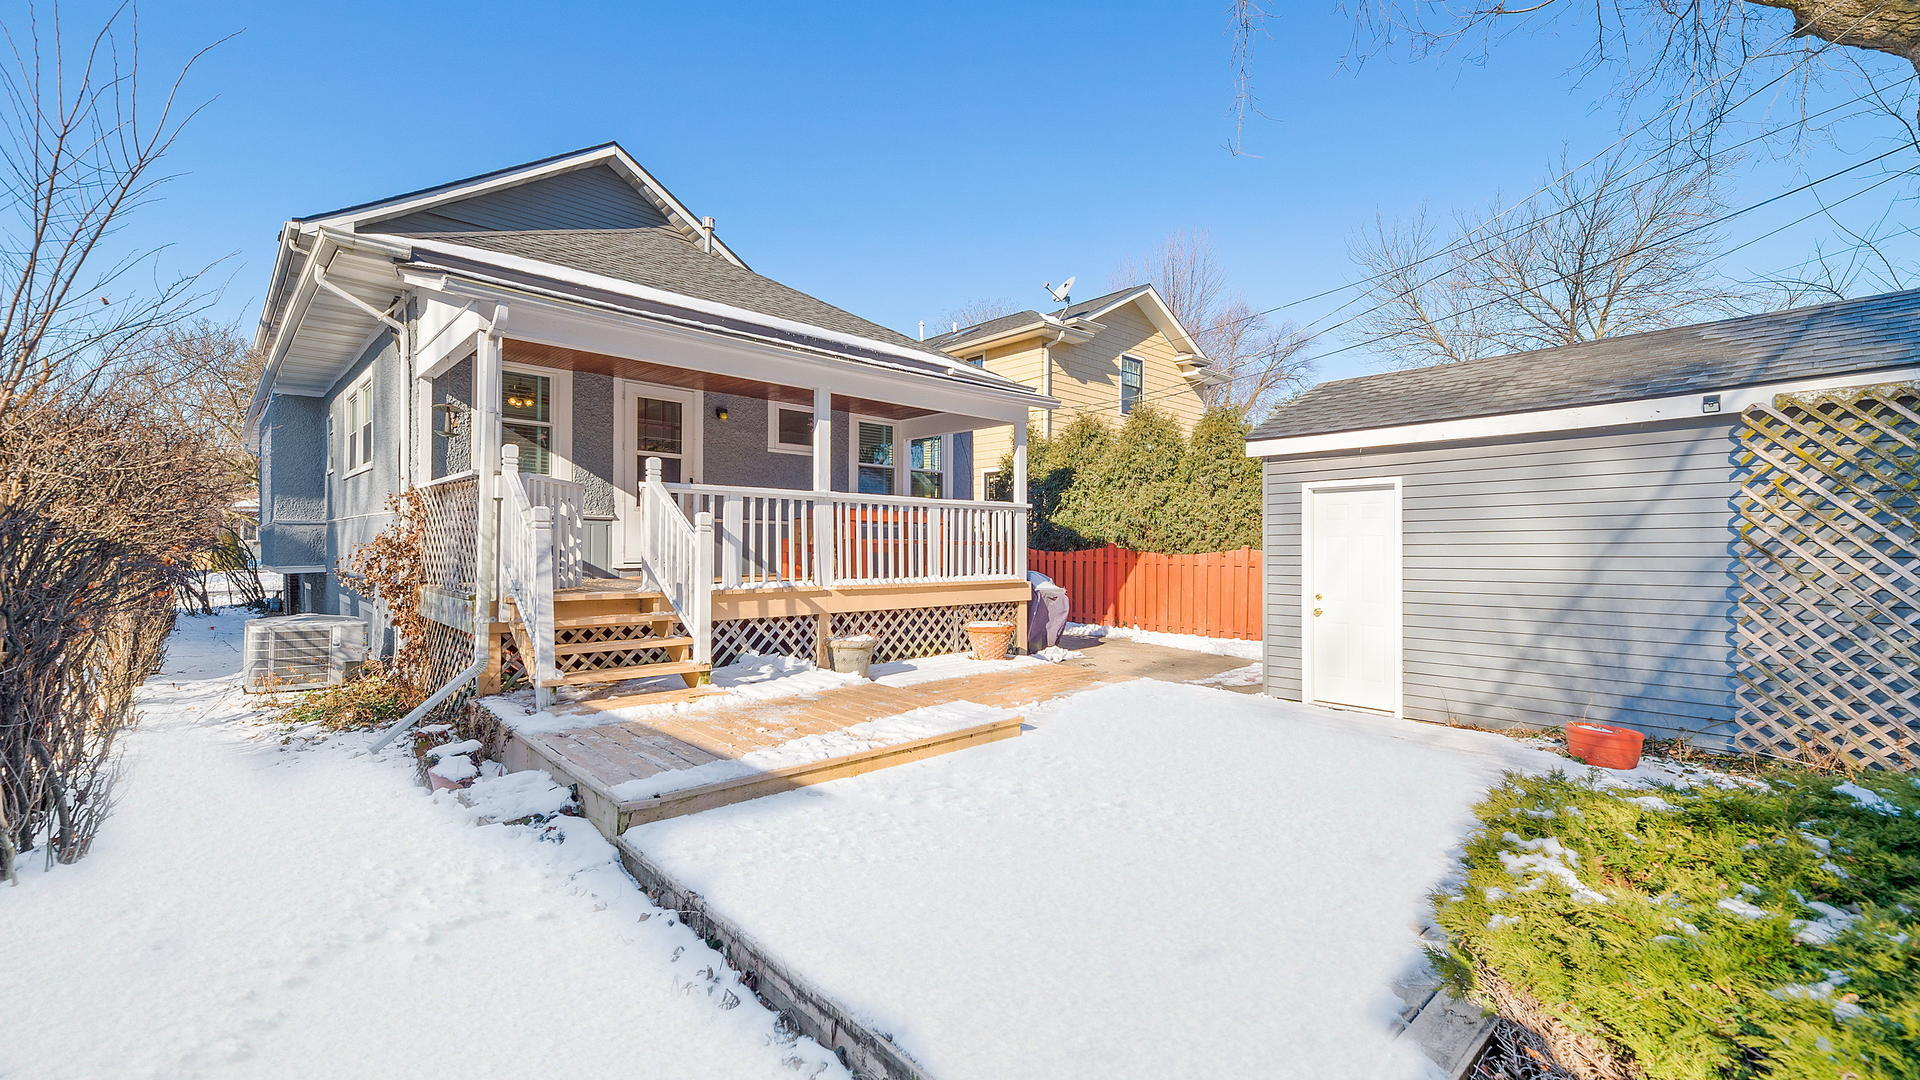 135 North Ashland, La Grange, Illinois, 60525